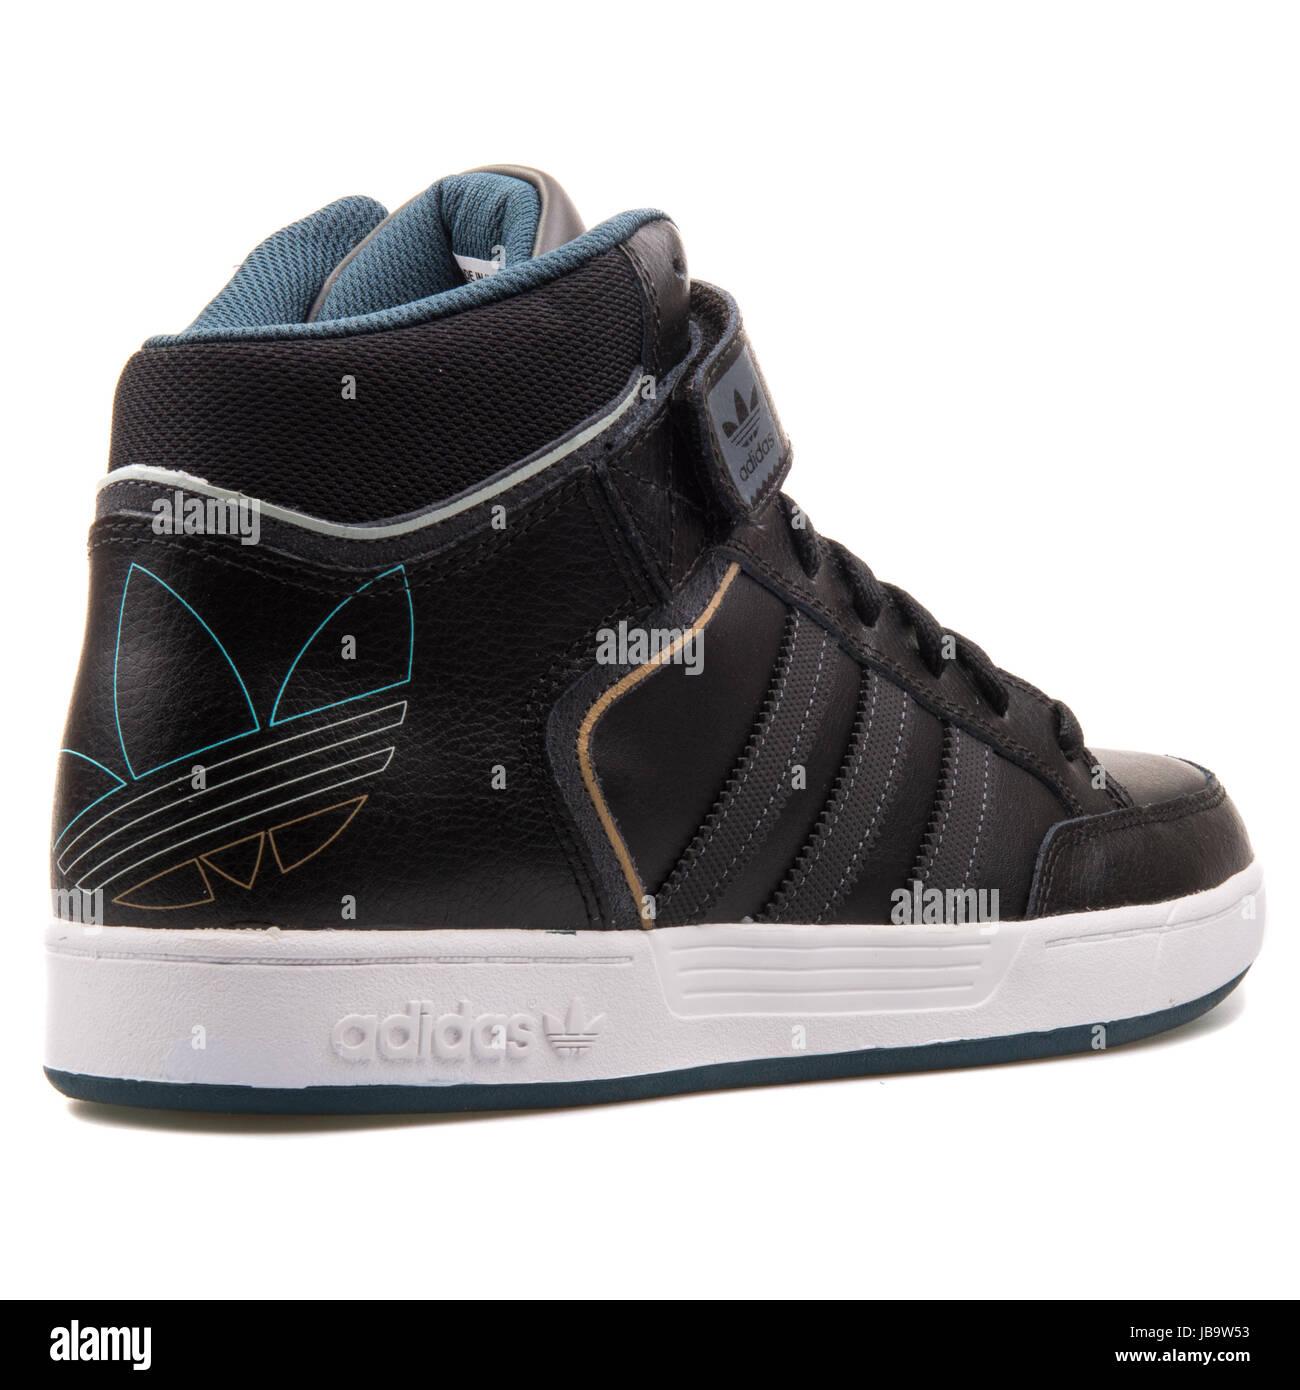 Hommes Basket Cuir Chaussures Varial Mid Ball Noir De Adidas vOmNy80wn